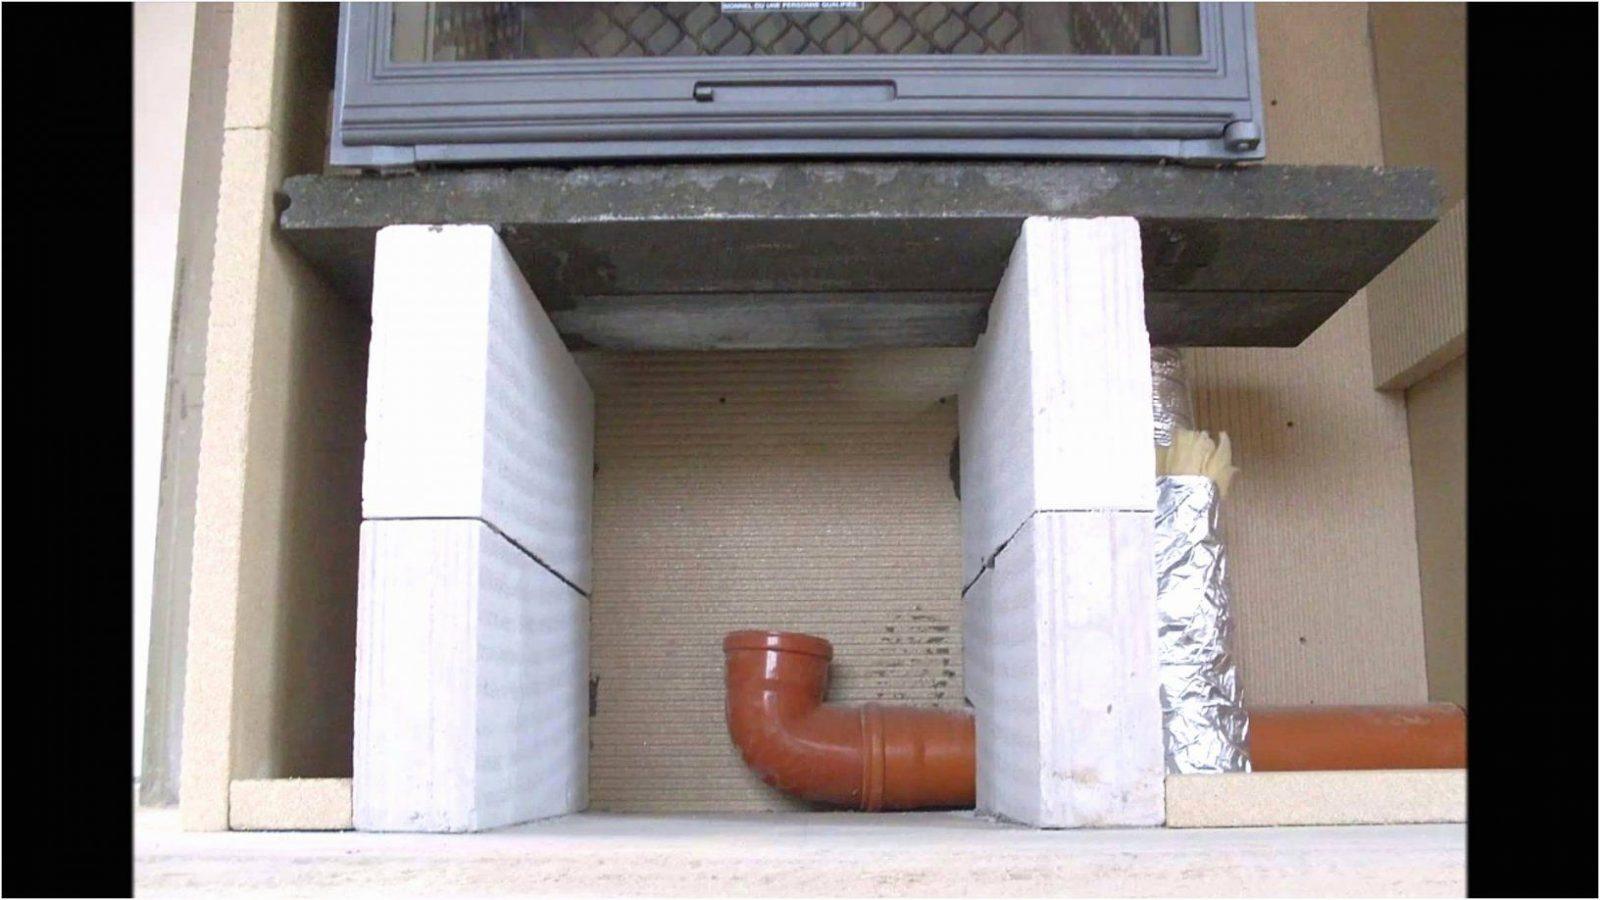 Bioethanol Kamin Selber Bauen Luxus 40 Elegant Bild Von Ethanol von Kamin Selber Bauen Anleitung Photo